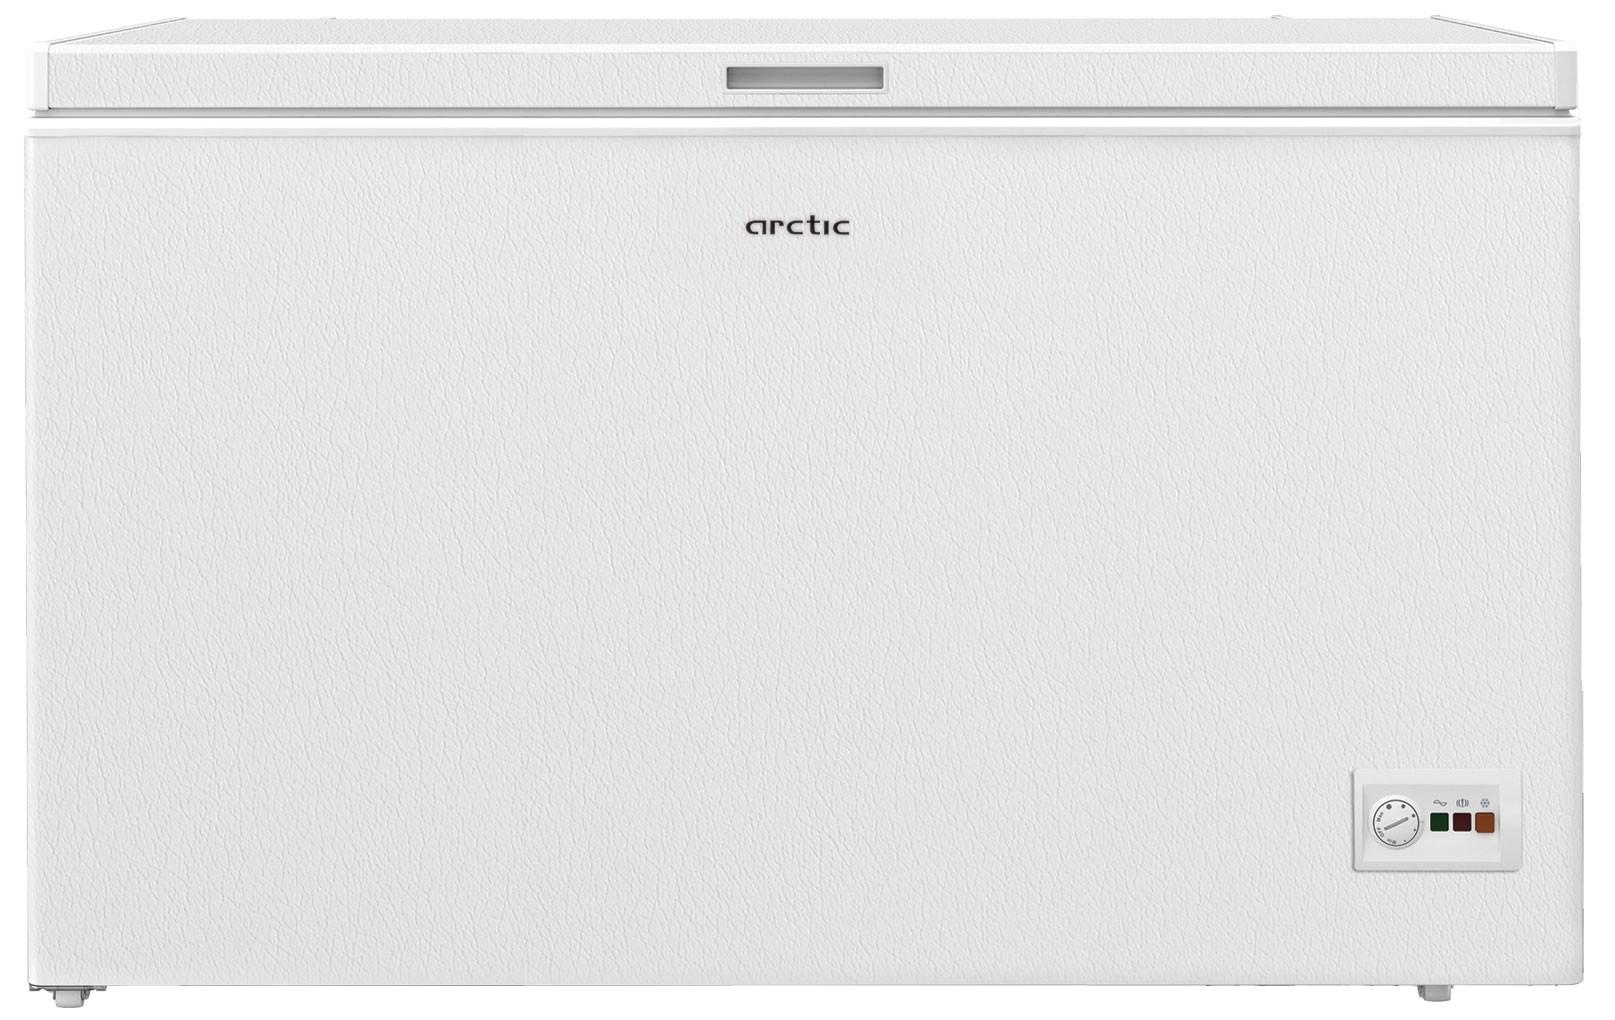 Lada frigorifica Arctic AO47P30